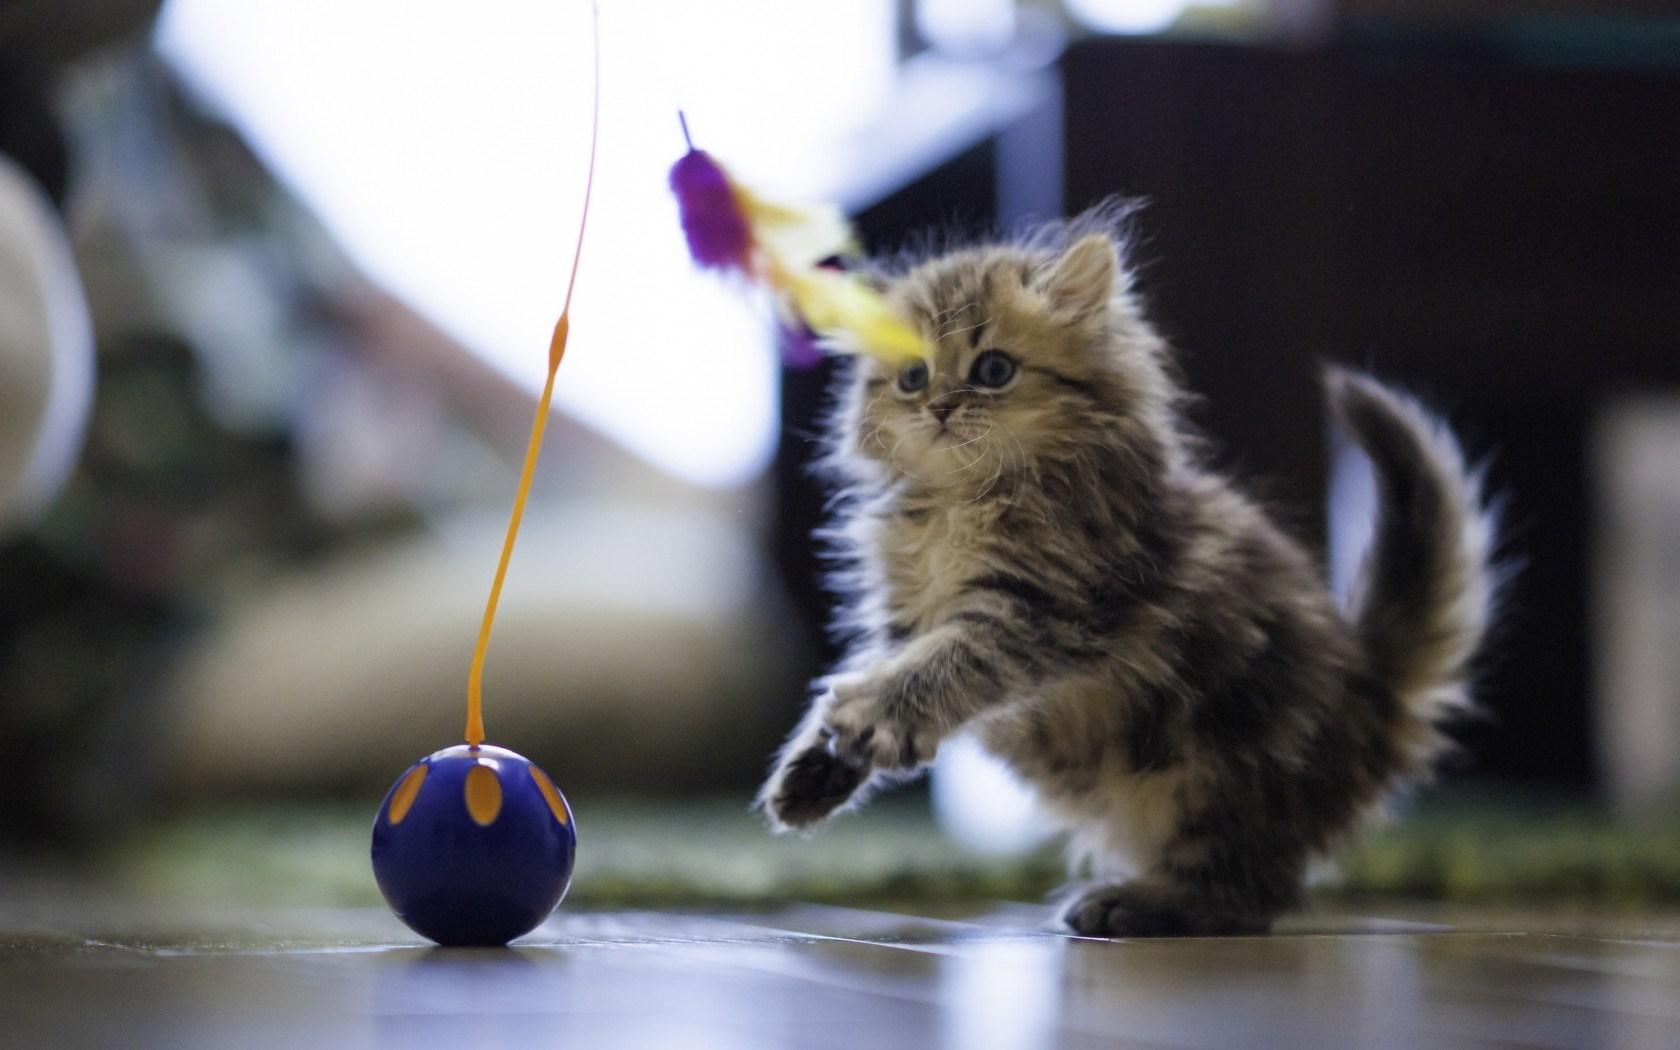 Kitten Toy Ball Feathers Play